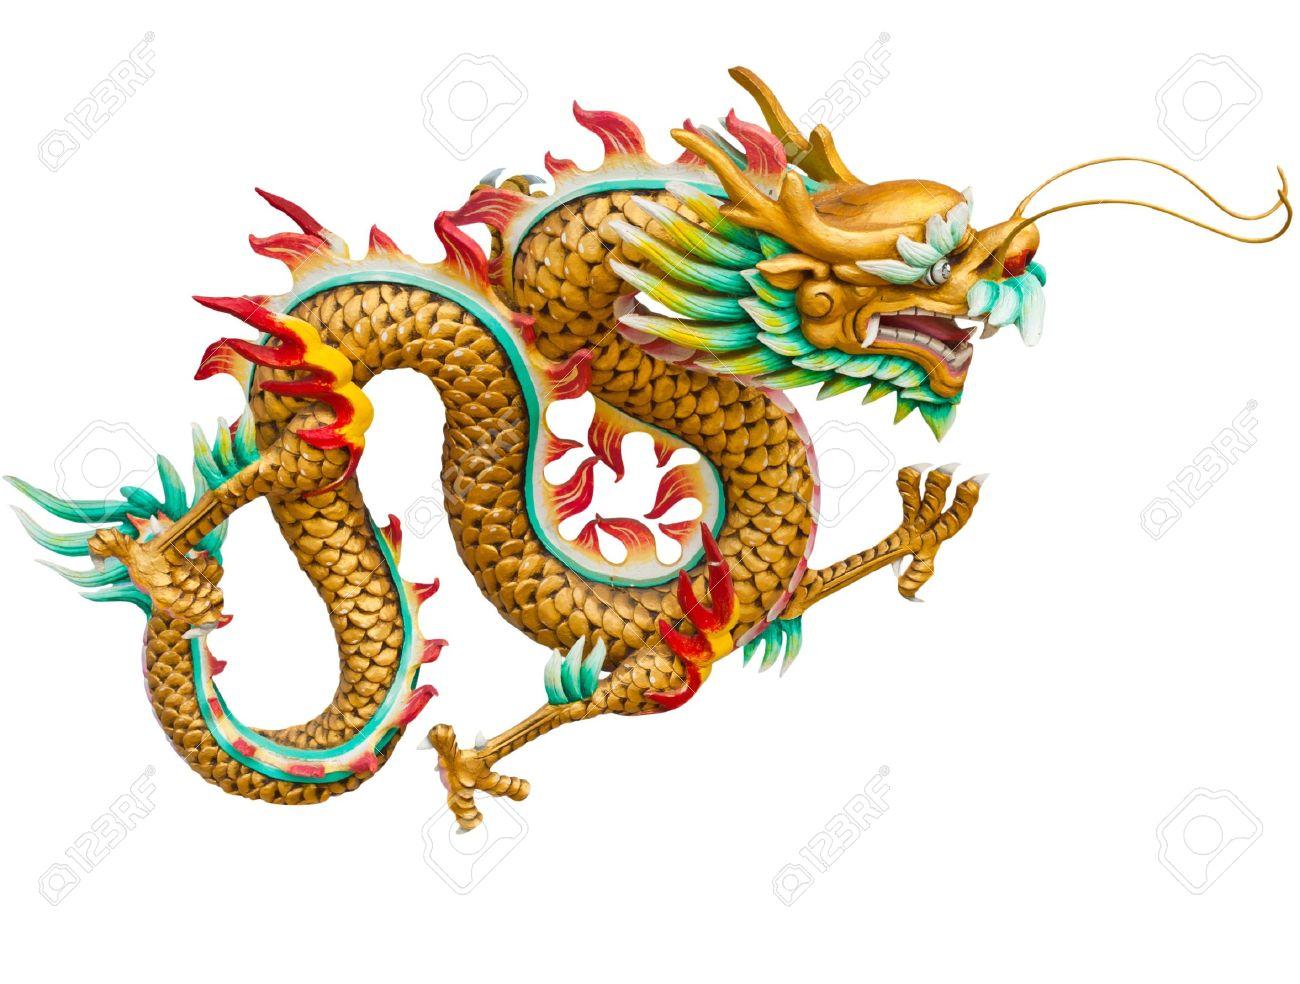 Golden dragon isolated on white background Stock Photo - 10748077